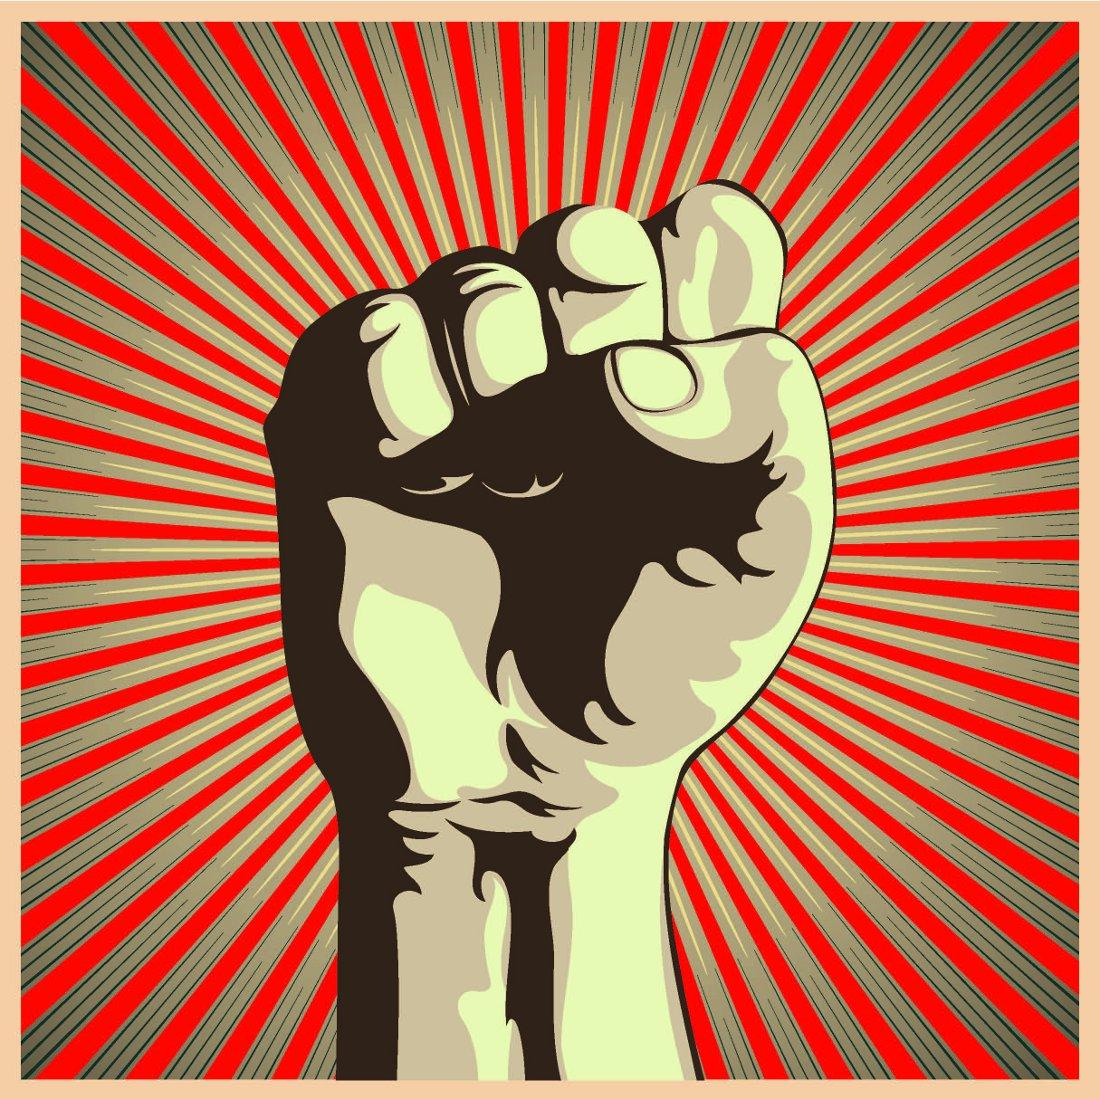 Sabaton fist for fight